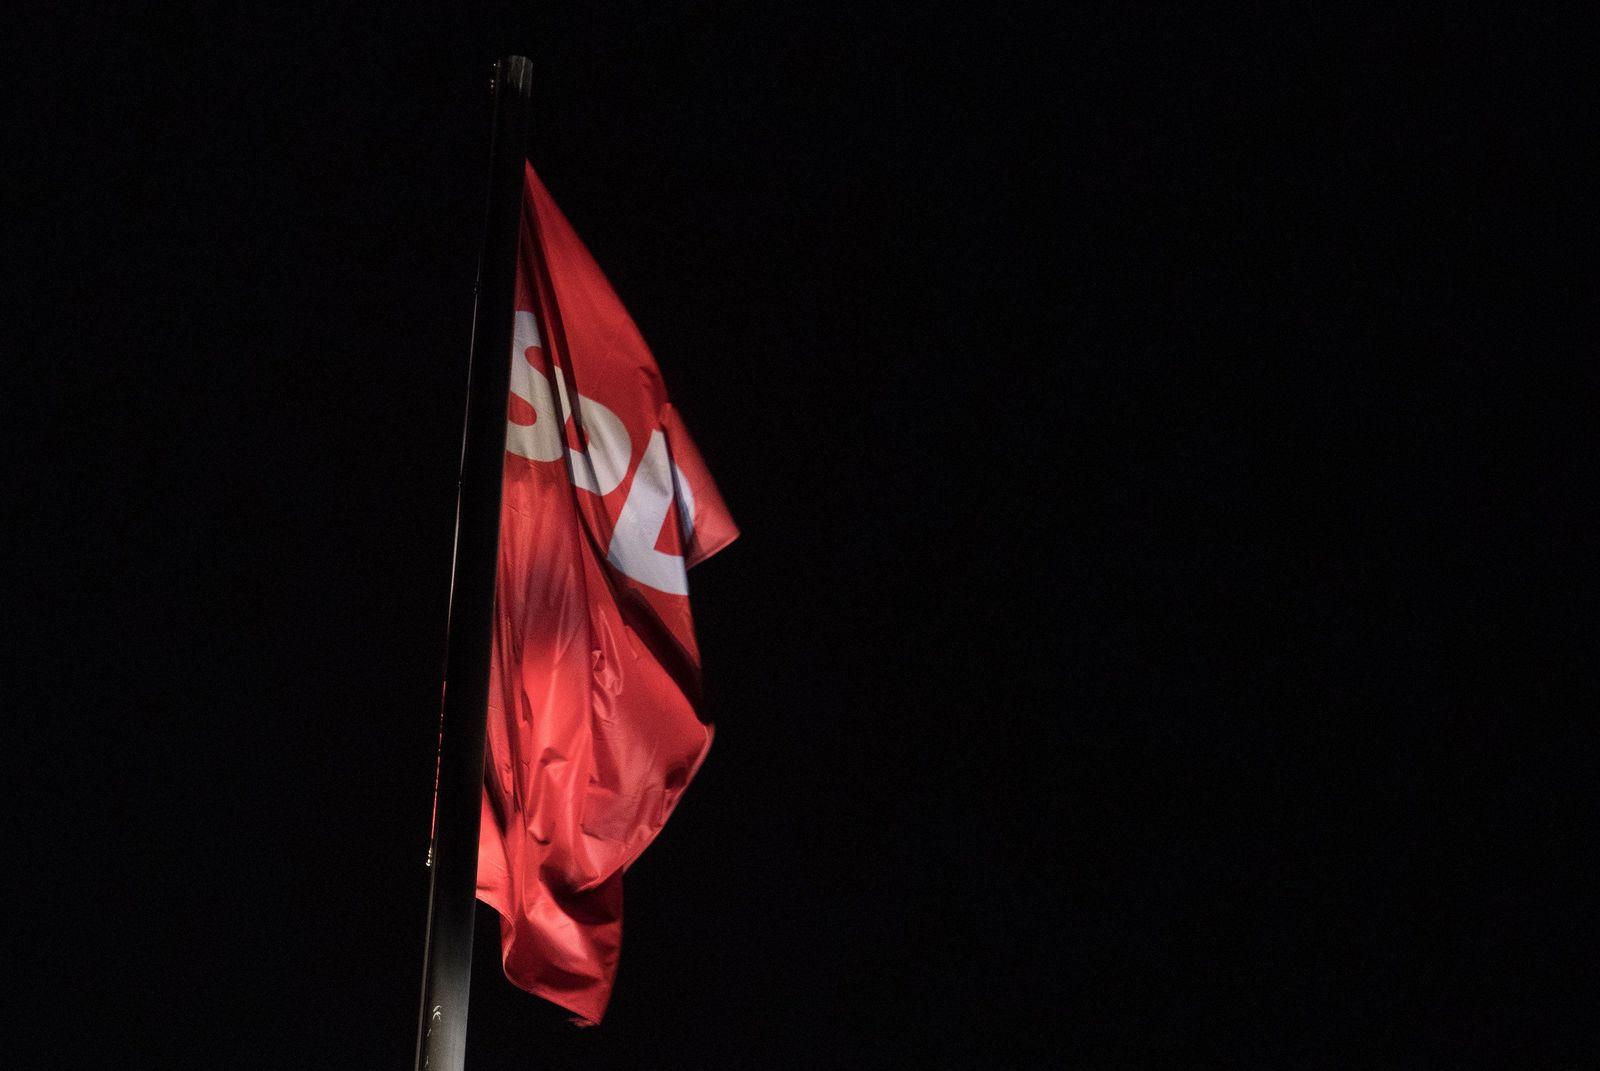 SPD vor unklarer Zukunft